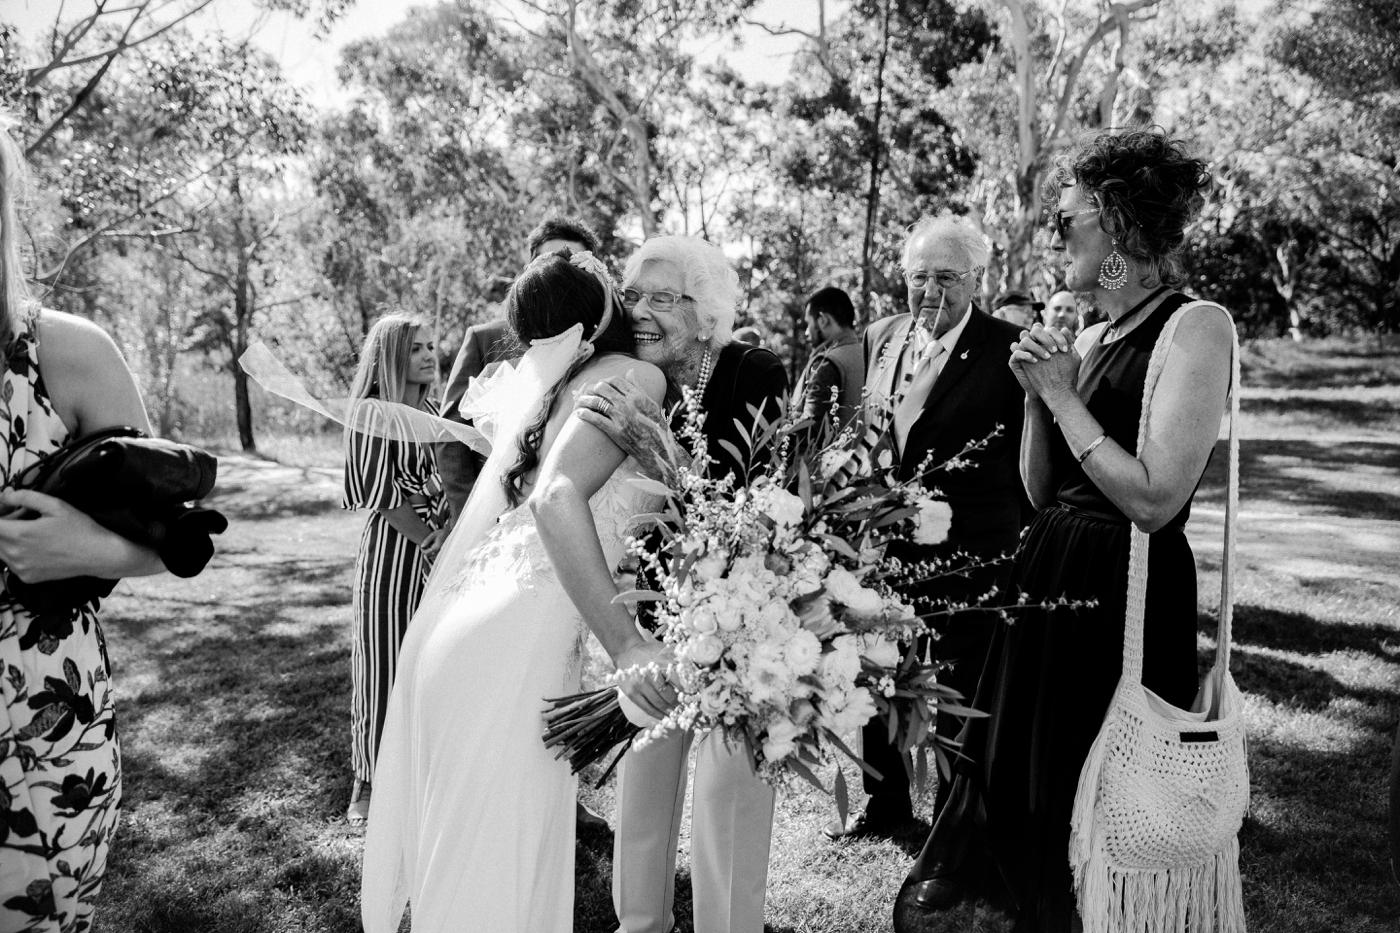 Maddy & Wes - K1 by Geoff Hardy Wedding - Adelaide Wedding Photographer - Natural wedding photography in Adelaide - Katherine Schultz_0037.jpg